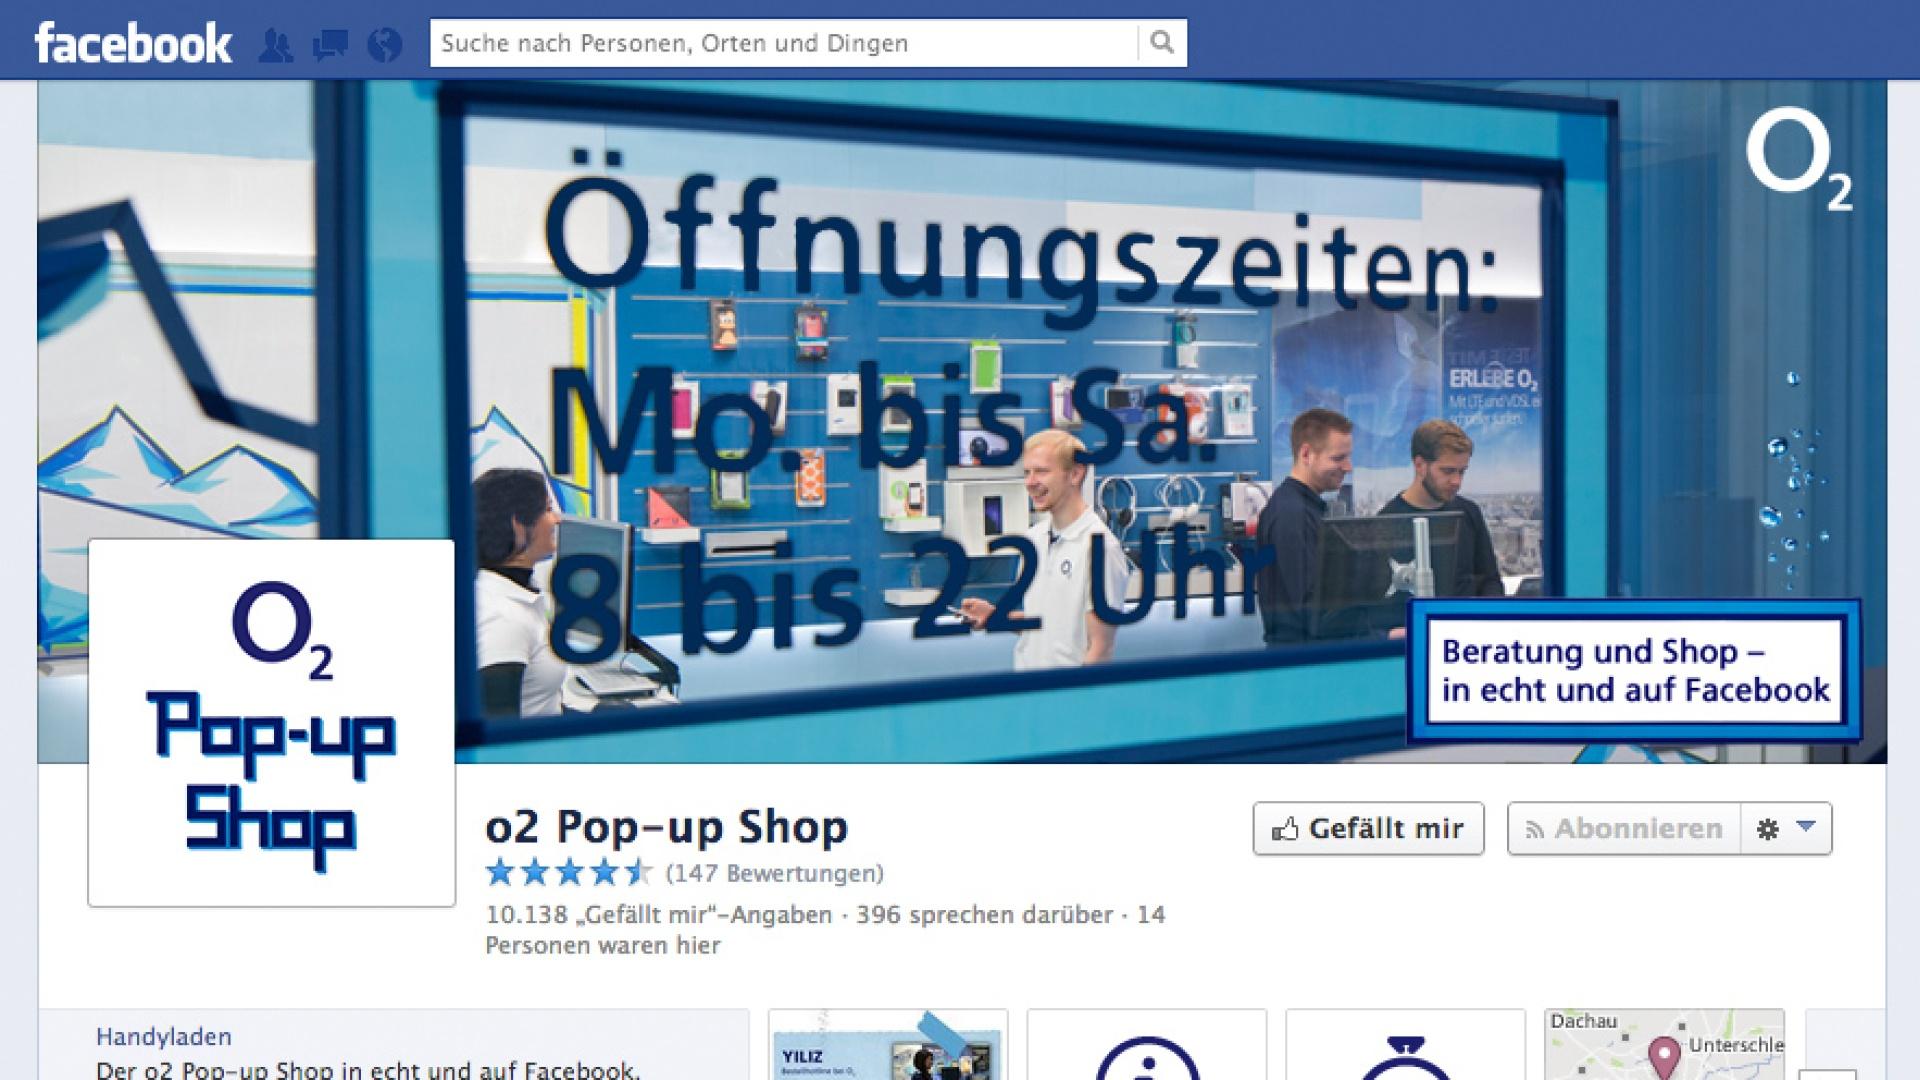 o2 Pop-up Shop digital und live